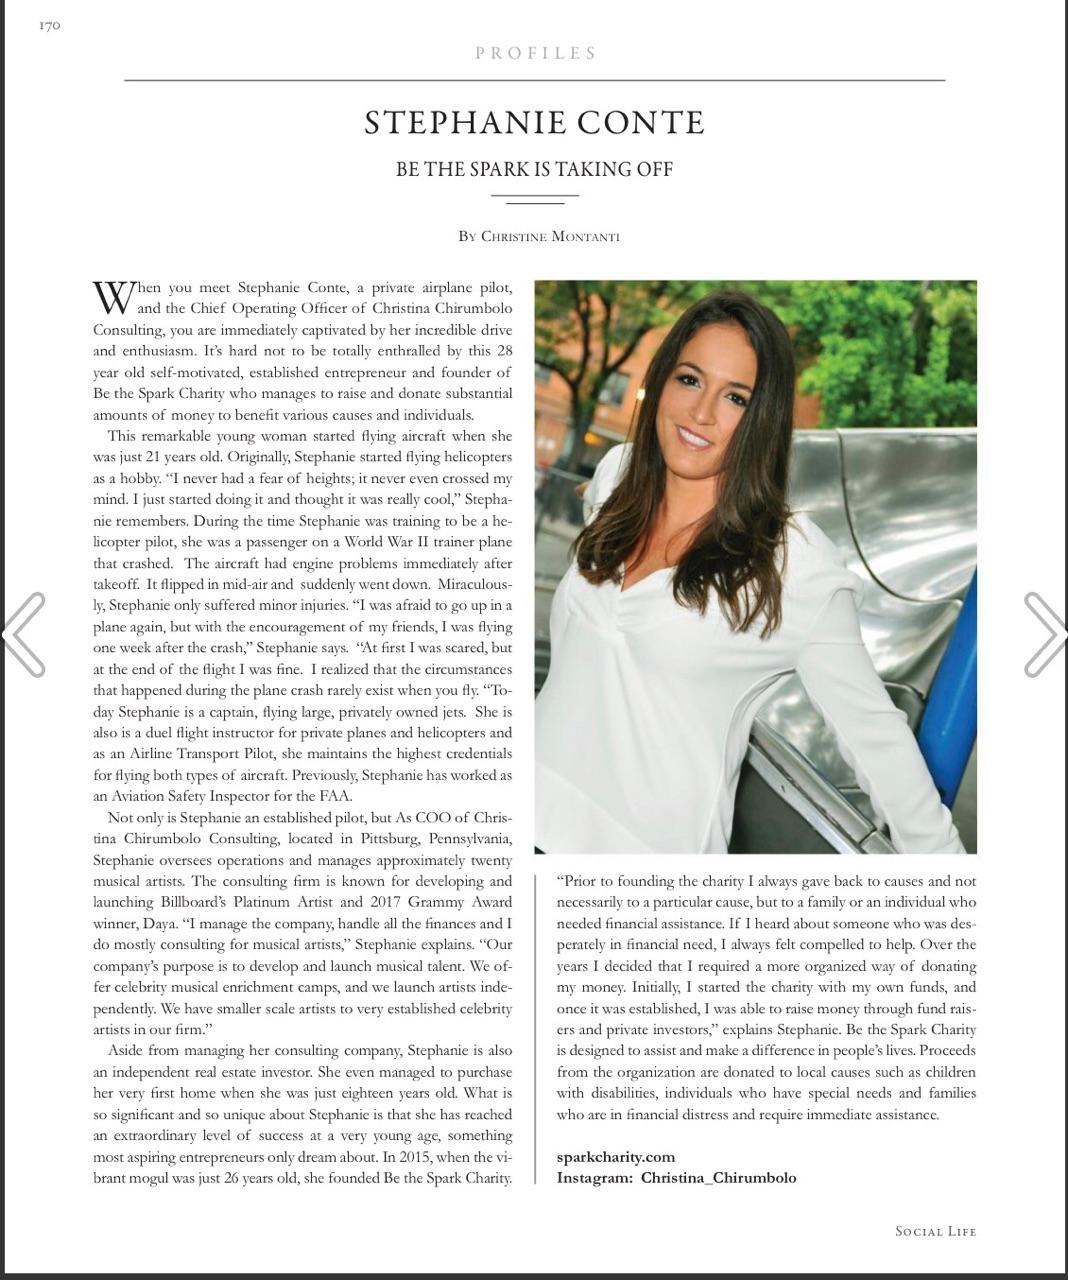 Stephanie.conte.magazine.